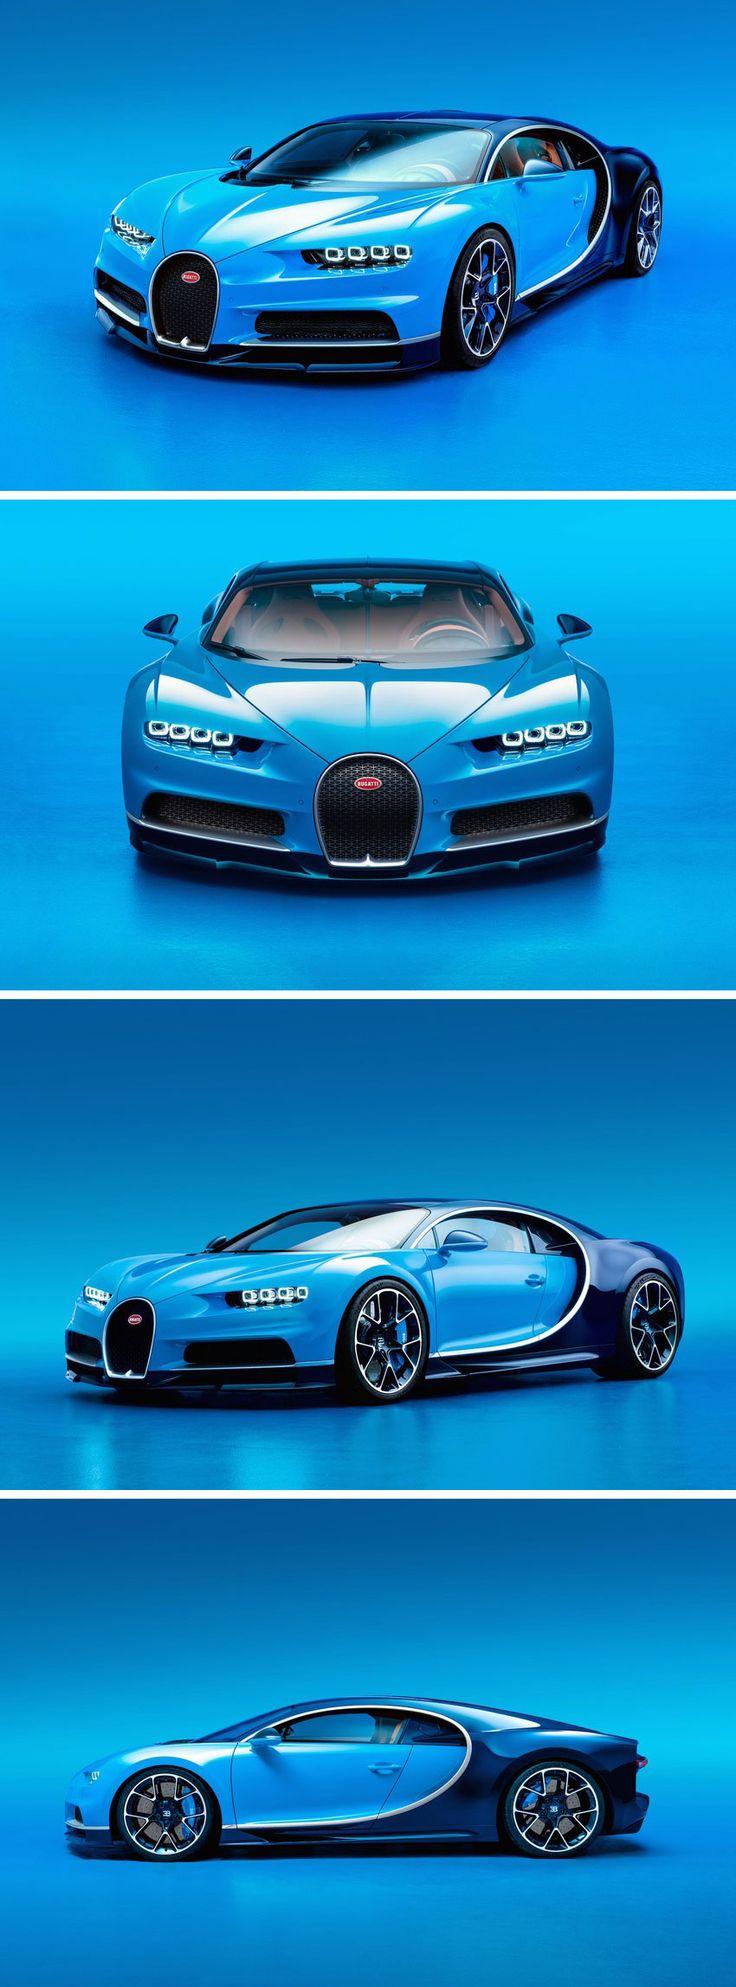 The Bugatti Chiron  #RePin by AT Social Media Marketing - Pinterest Marketing Specialists ATSocialMedia.co.uk